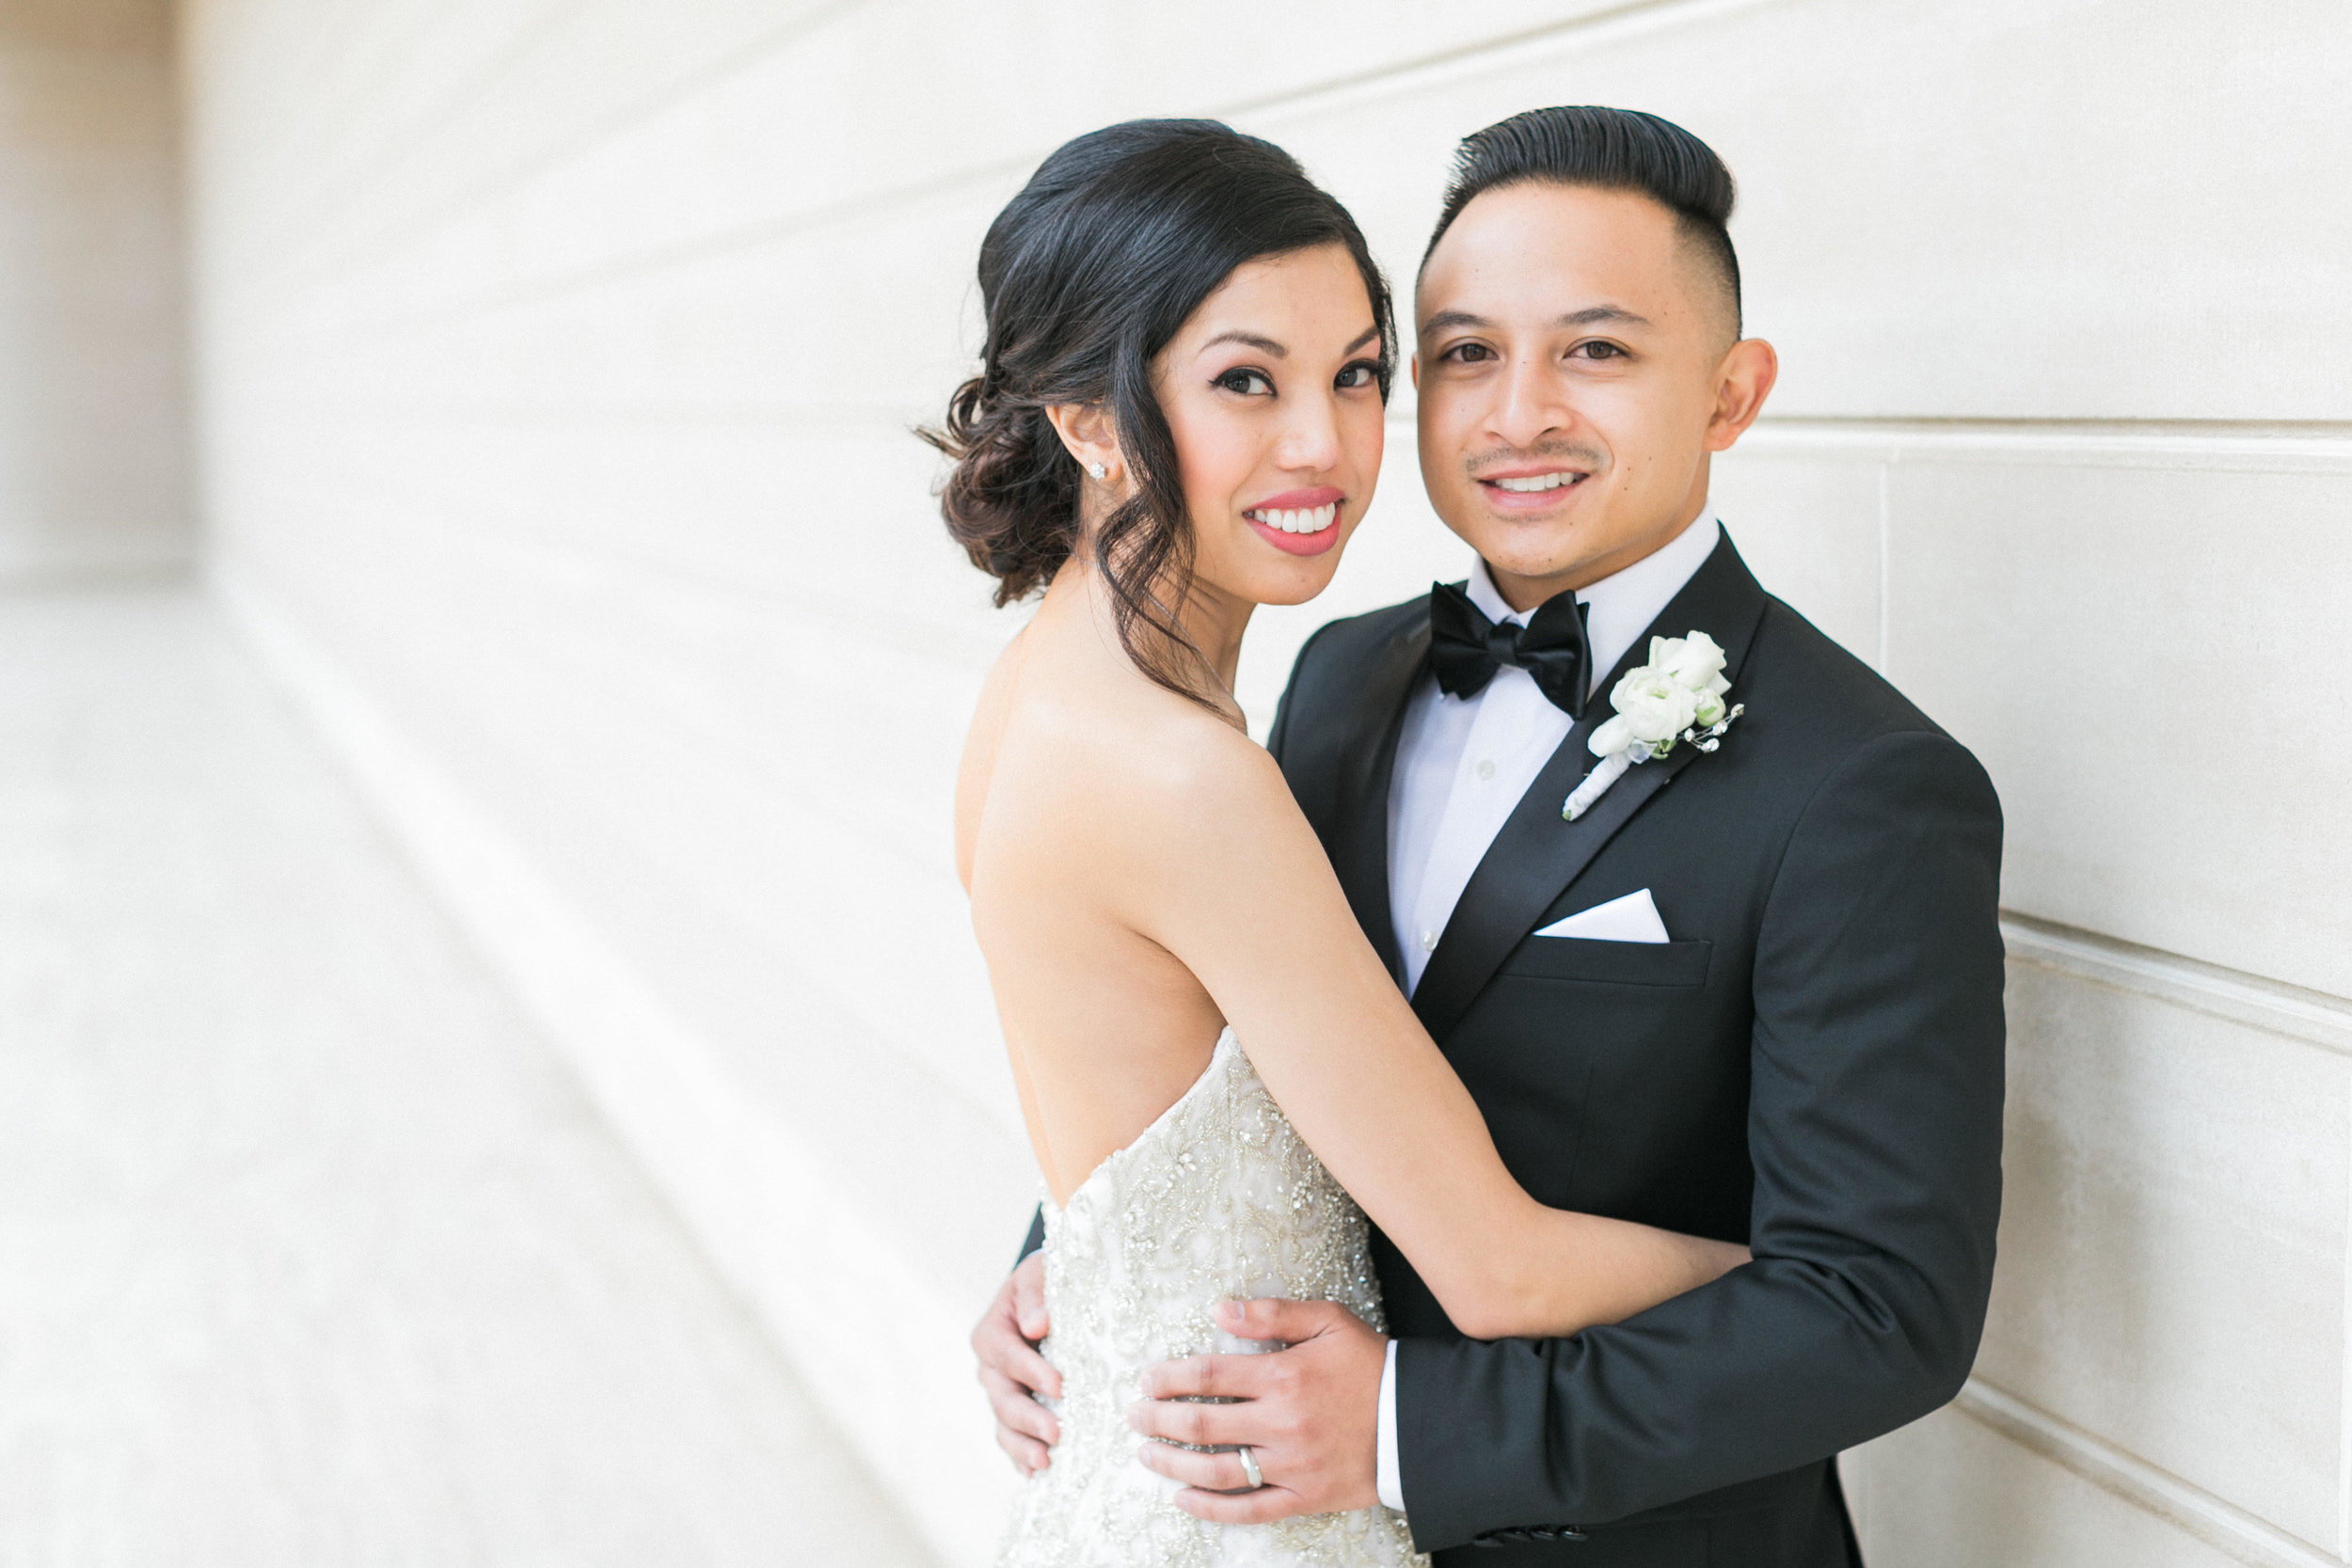 maria-lee-wedding-makeup-hair-sf_karen-roy.jpg